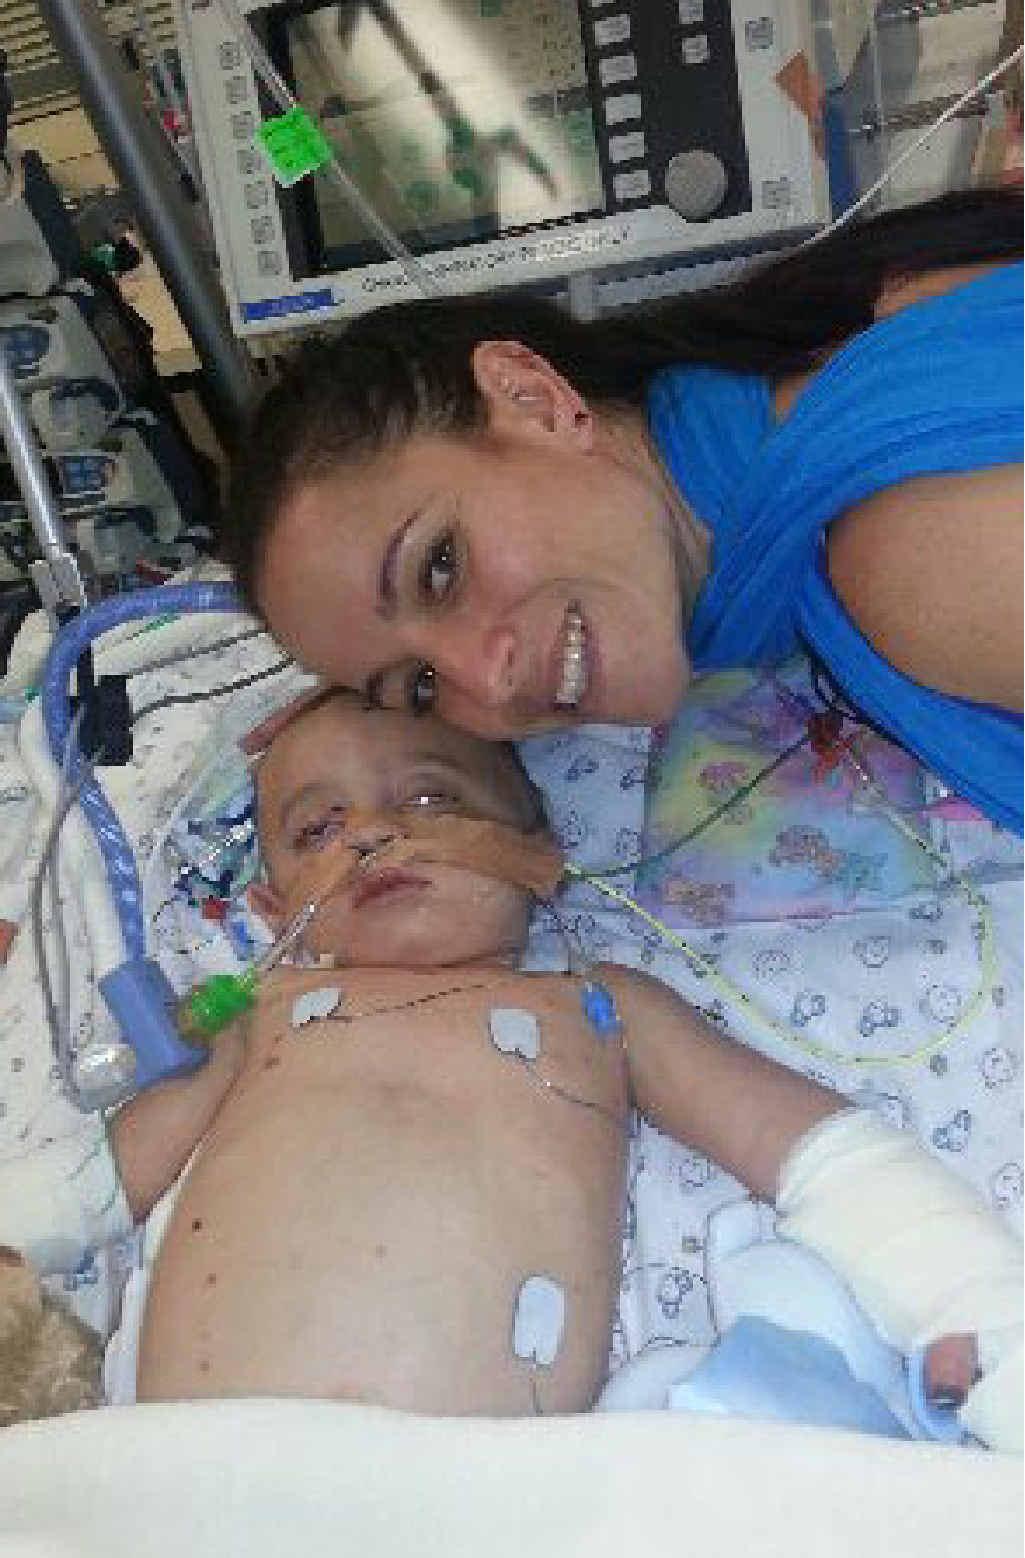 LONG JOURNEY: Sarah Smith comforts her son Finn in Royal Brisbane Hospital.